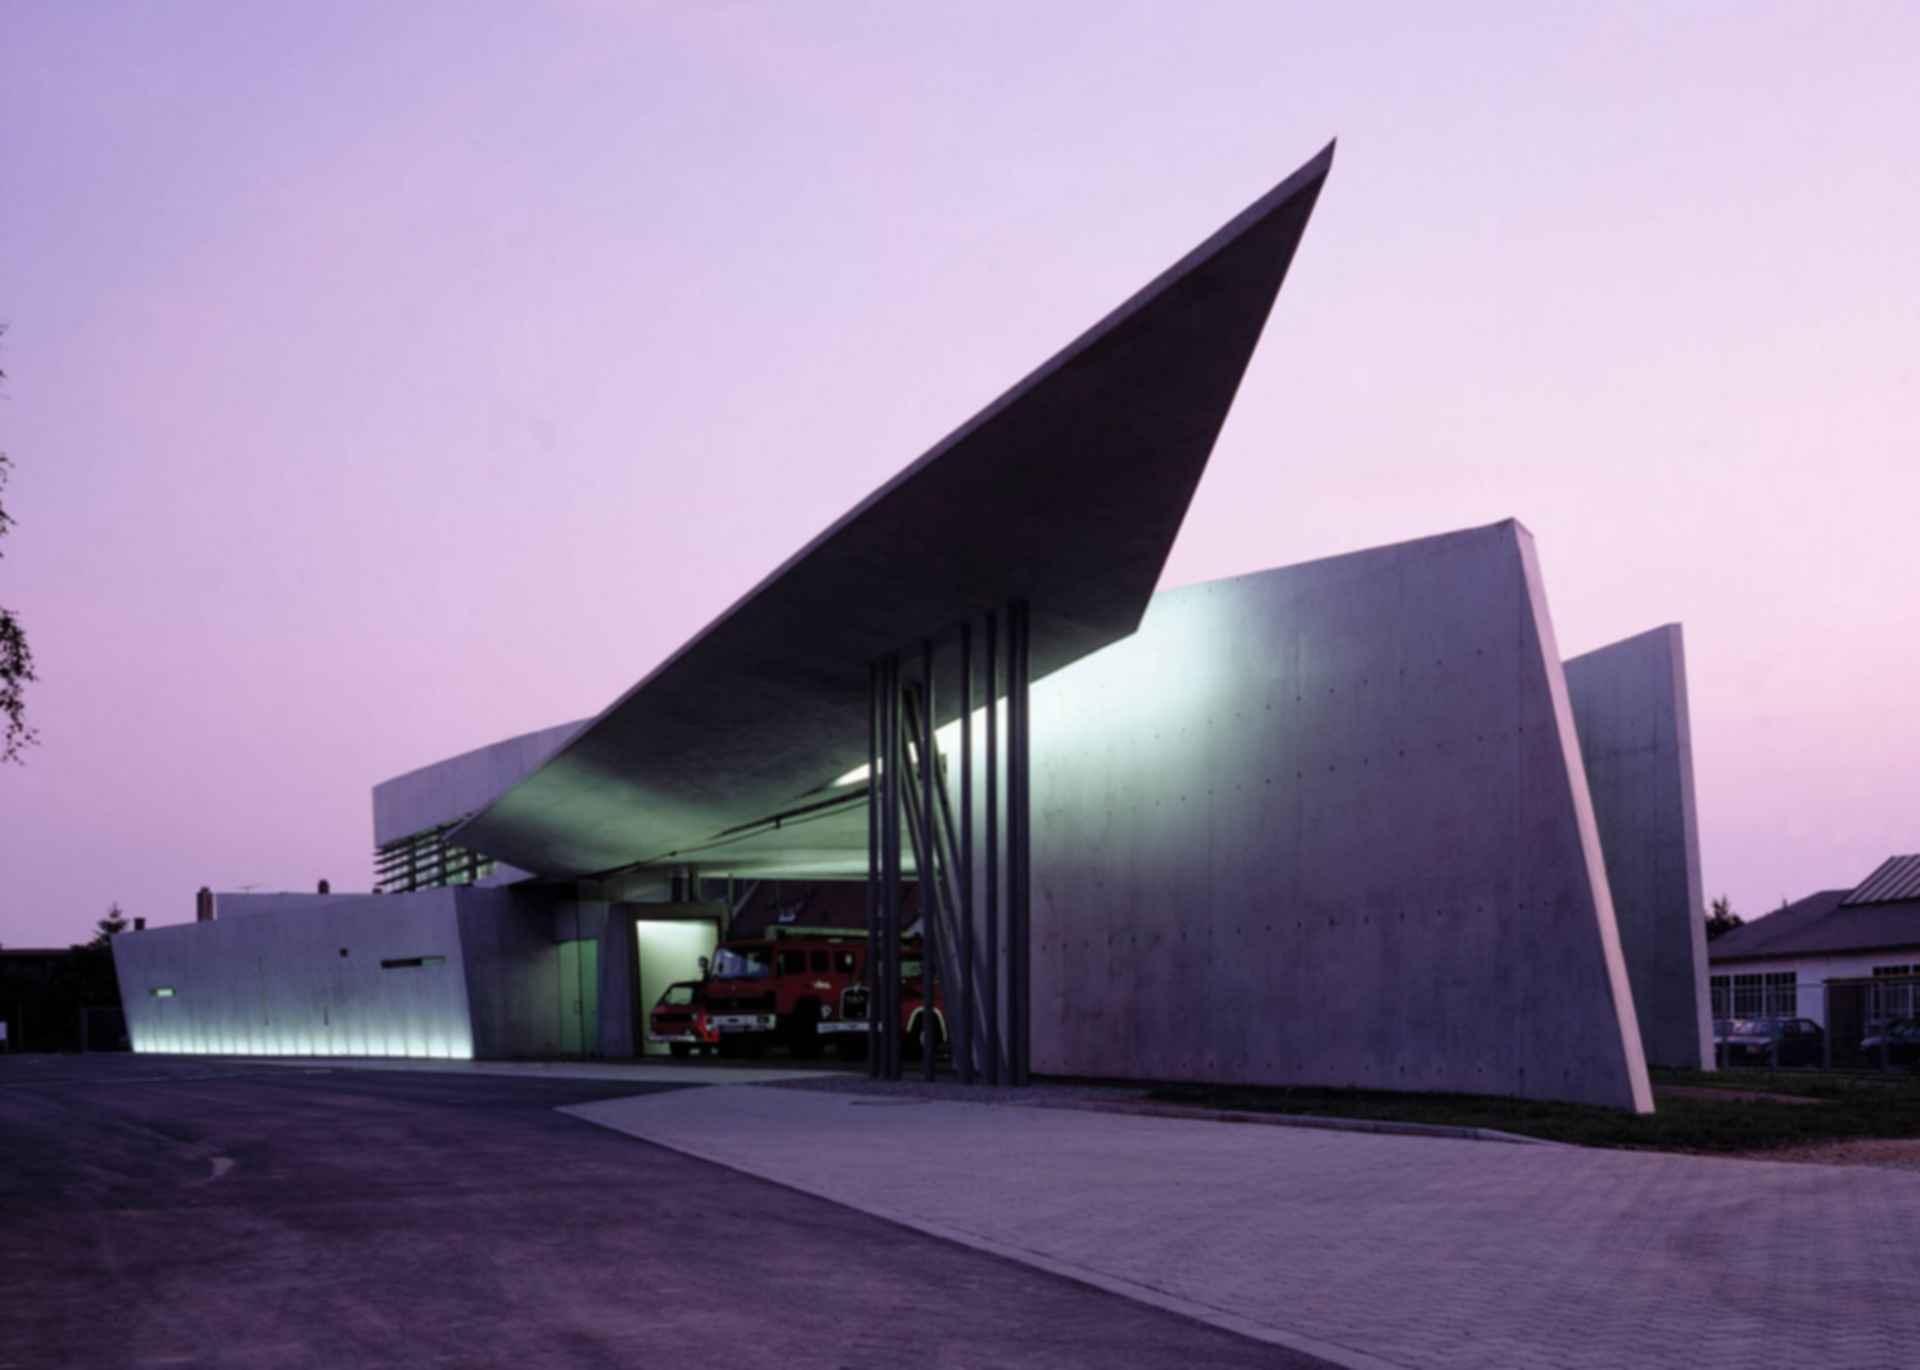 Vitra Fire Station - Exterior/Entrance